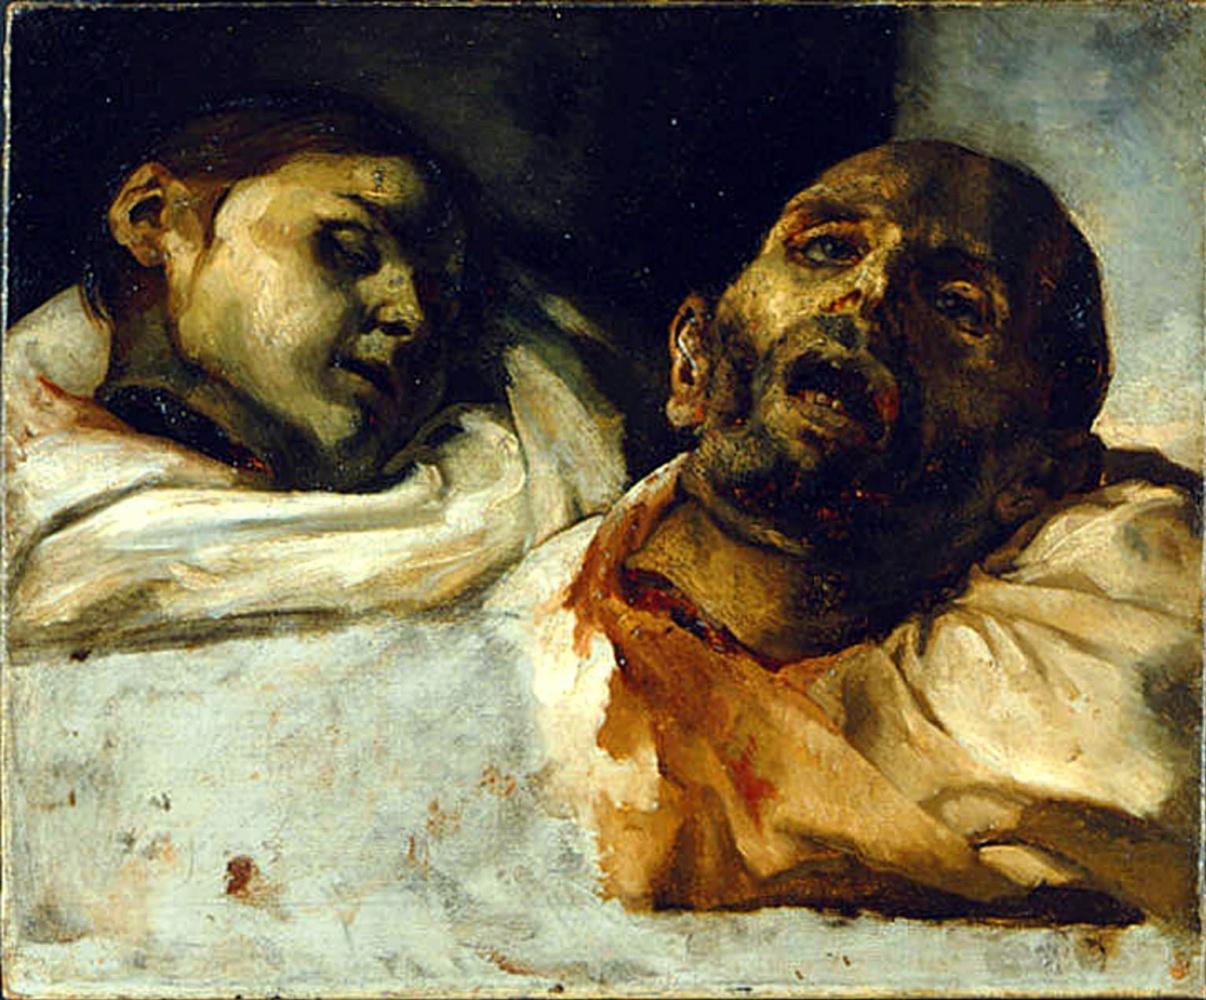 Théodore Géricault. Guillotine chopped off heads